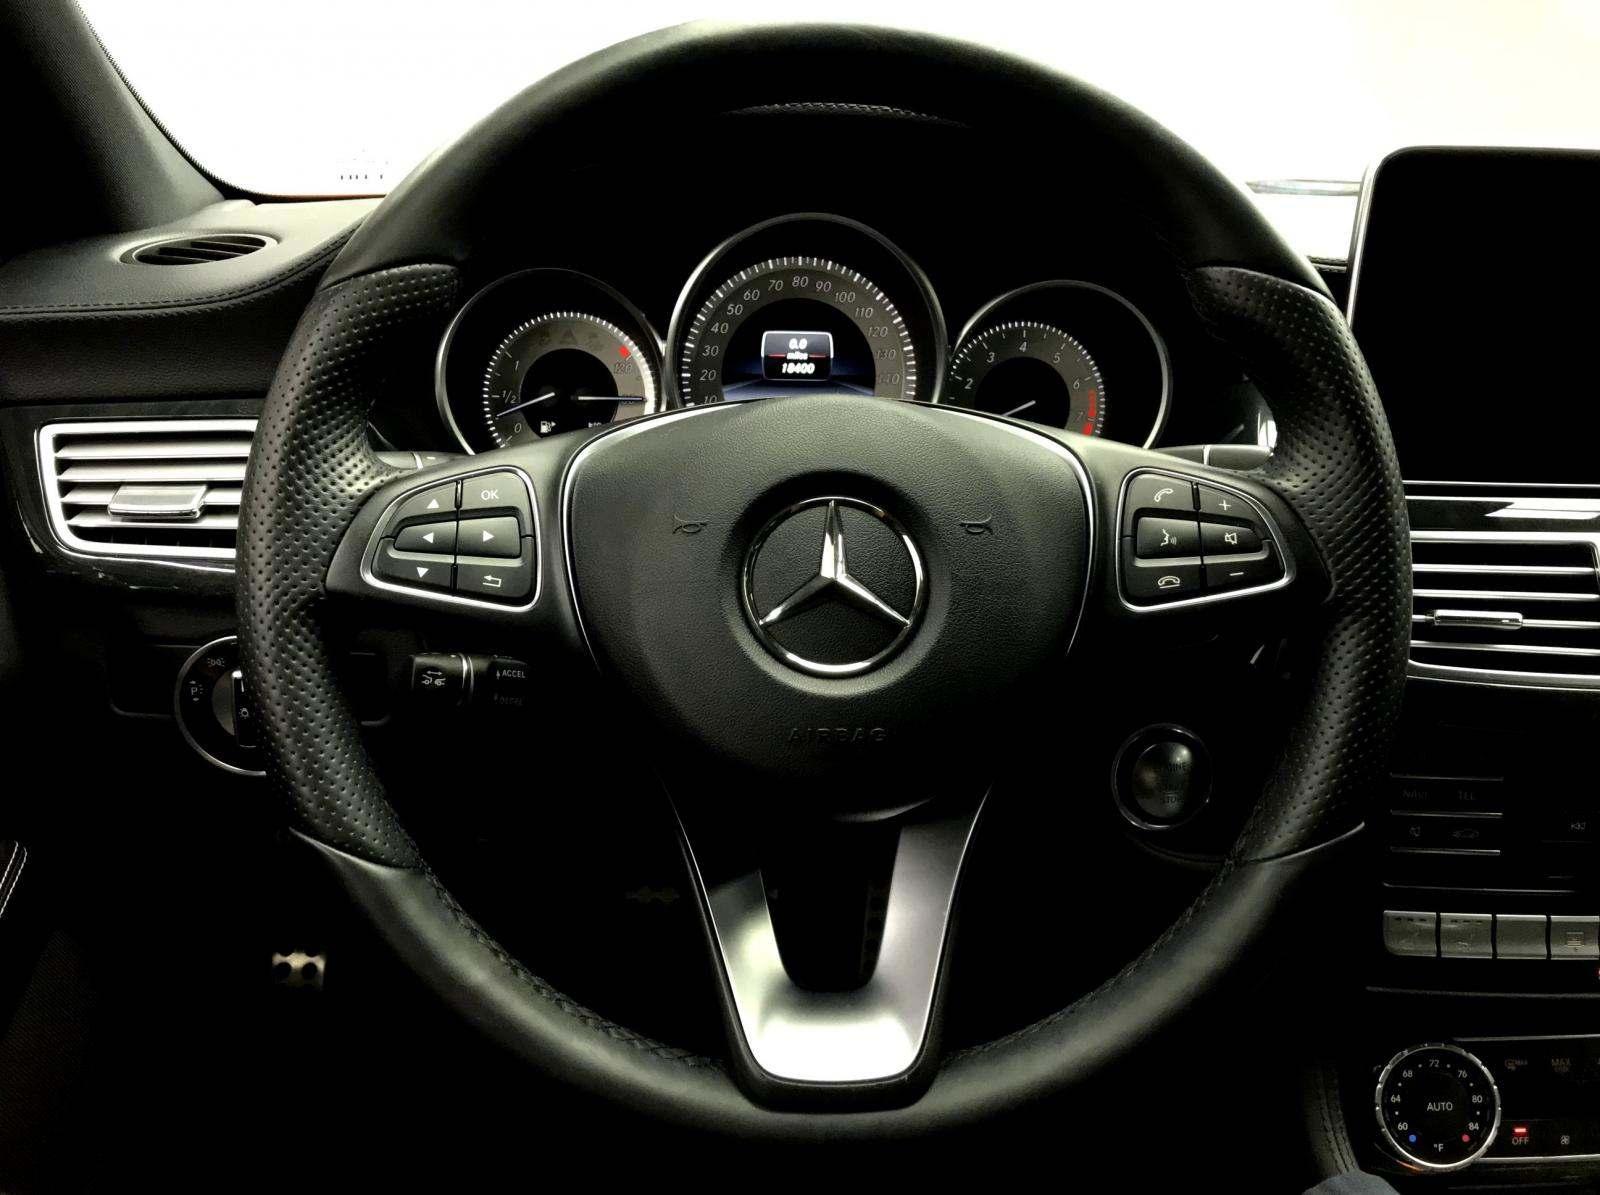 used Mercedes-Benz CLS-Class 2016 vin: WDDLJ9BB5GA186545